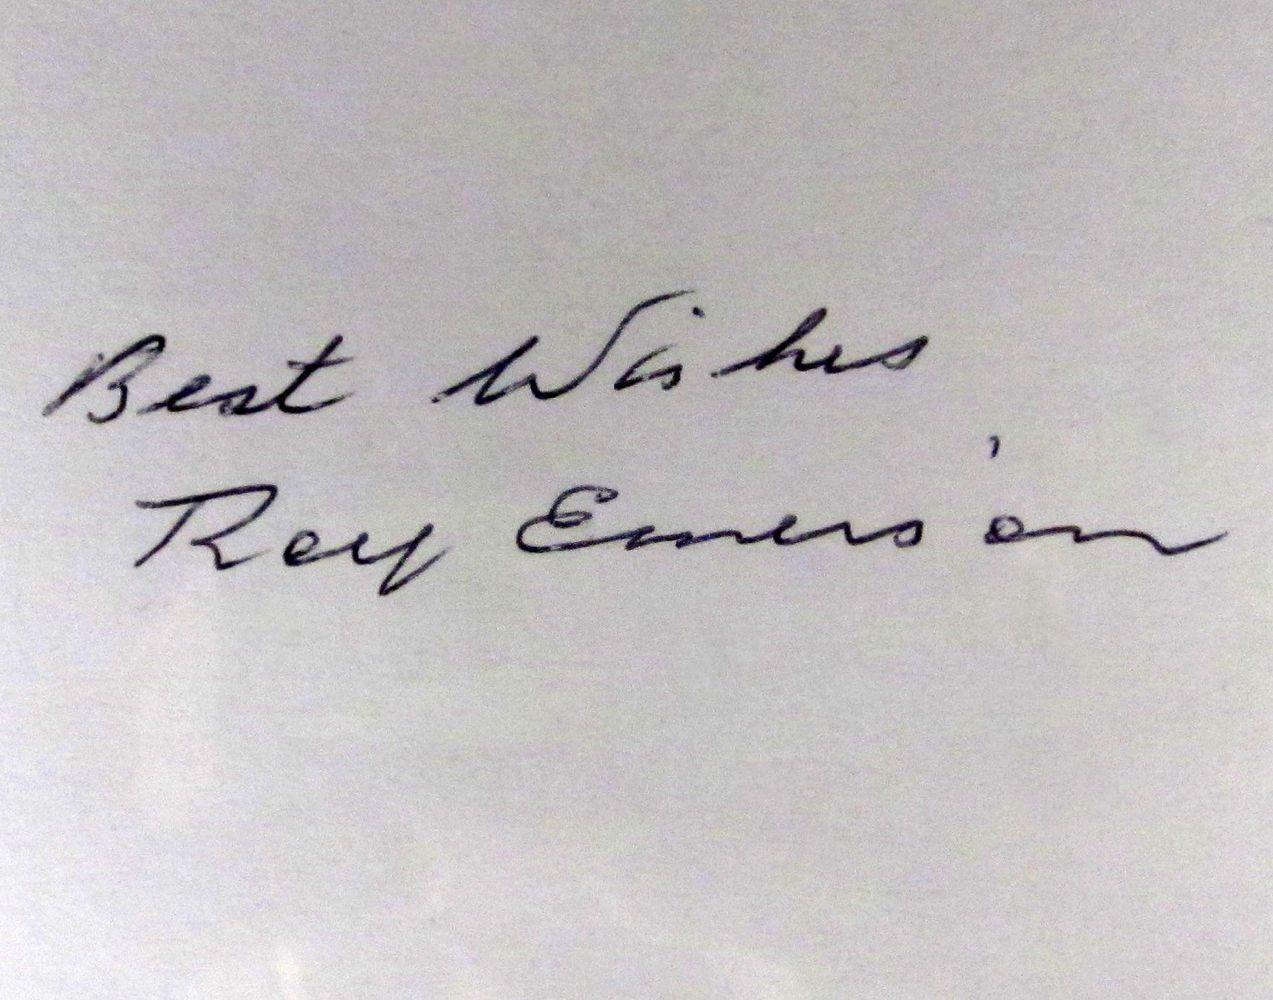 Tennis Roy Emerson